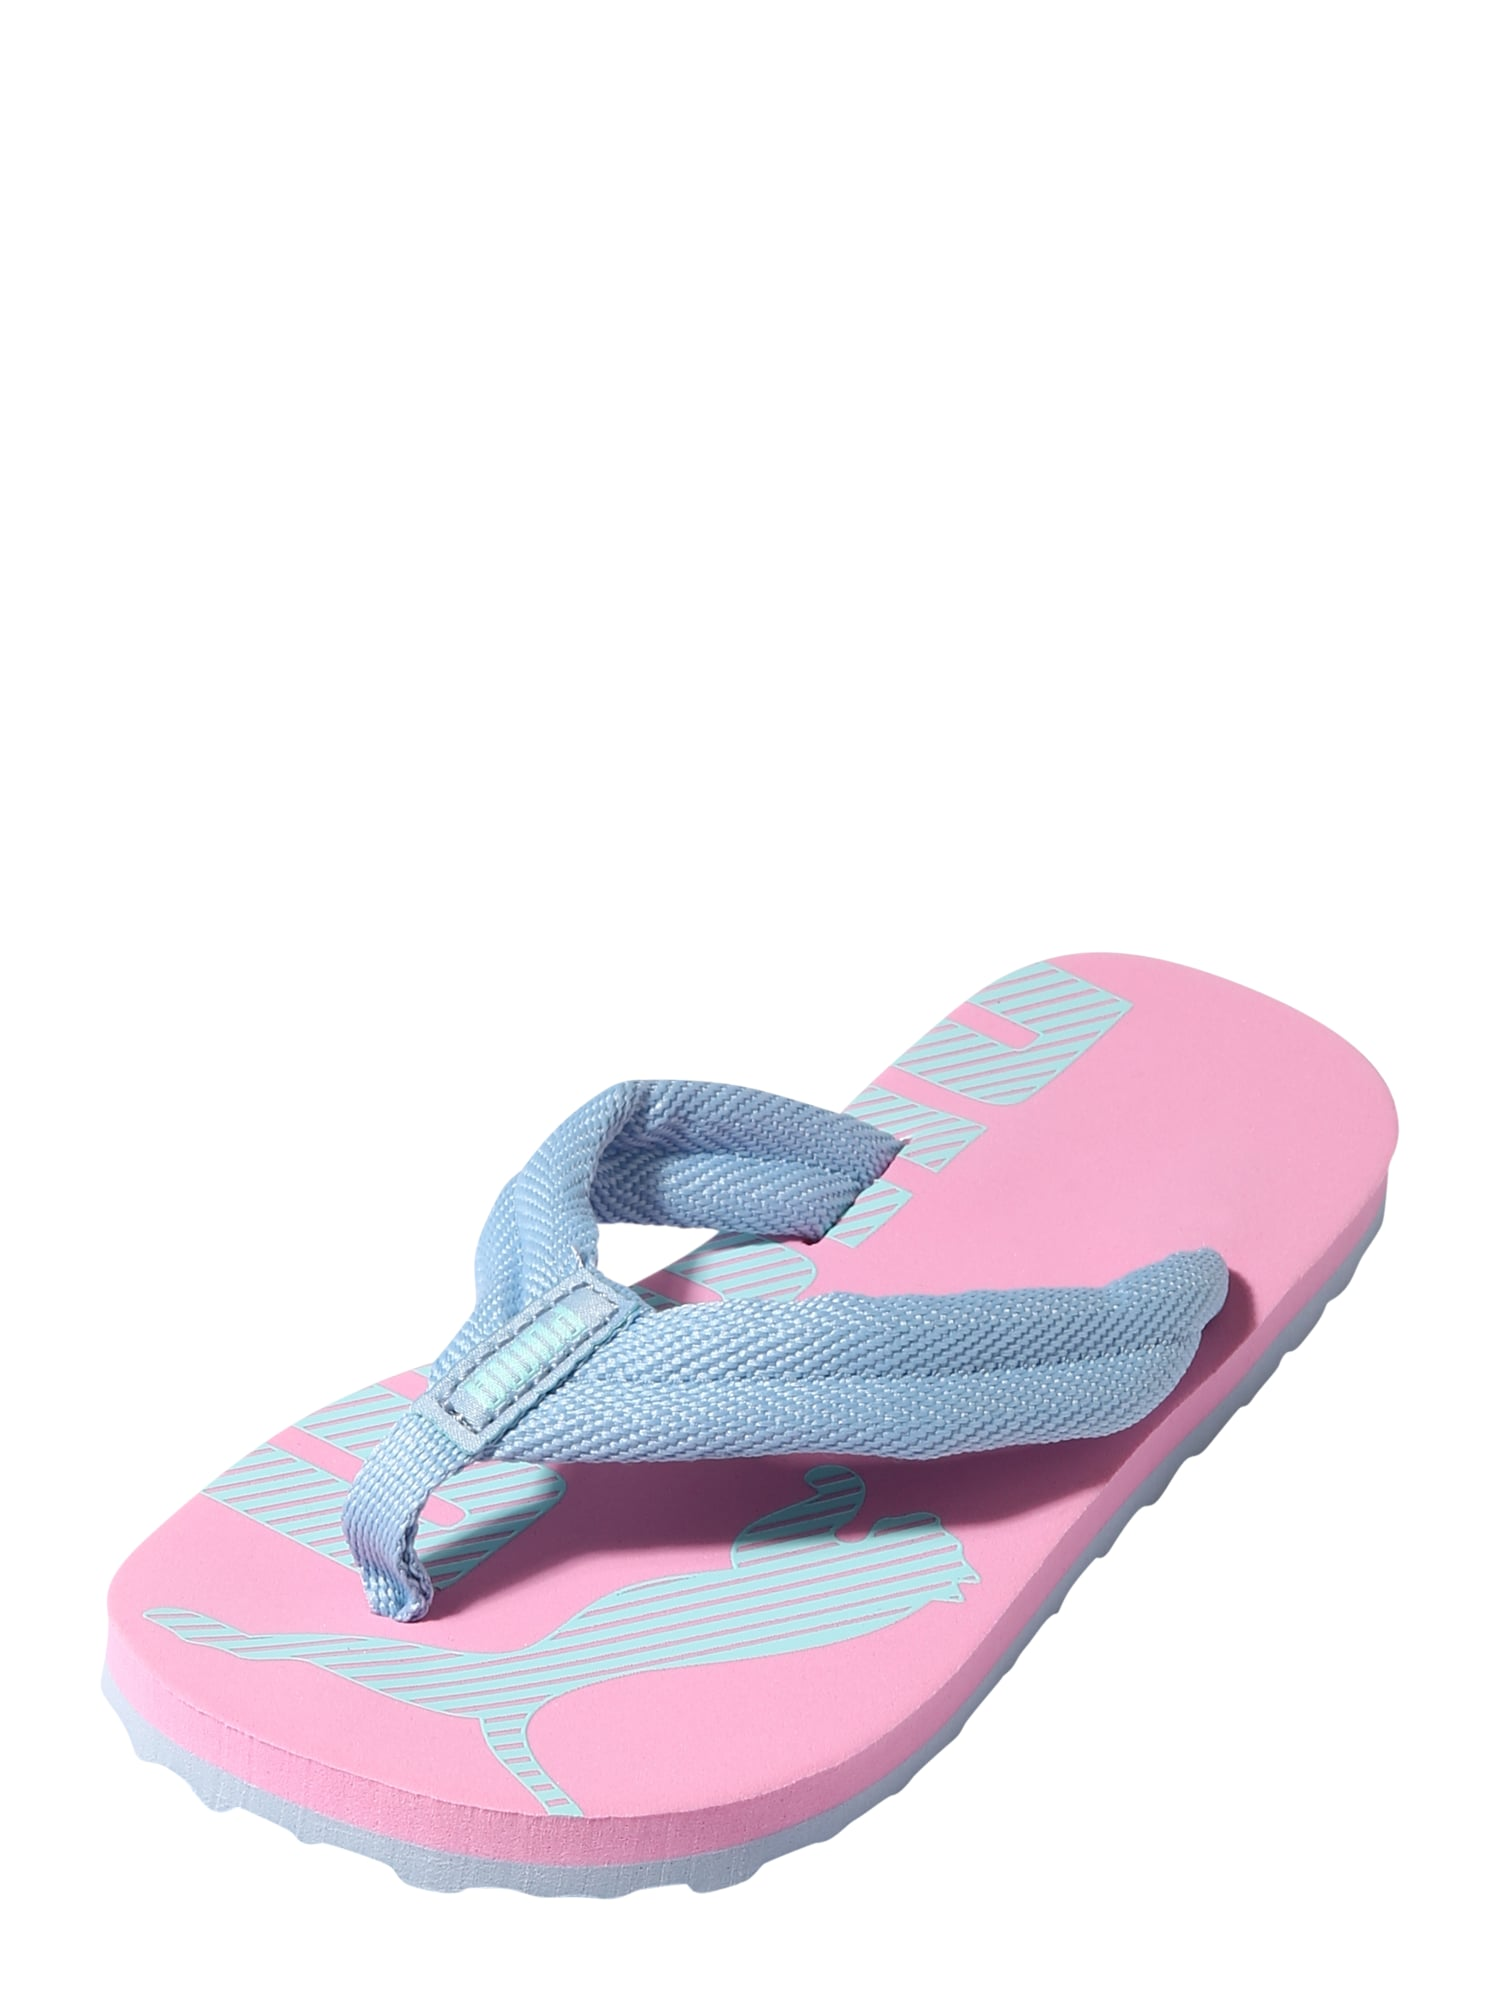 PUMA Atviri batai